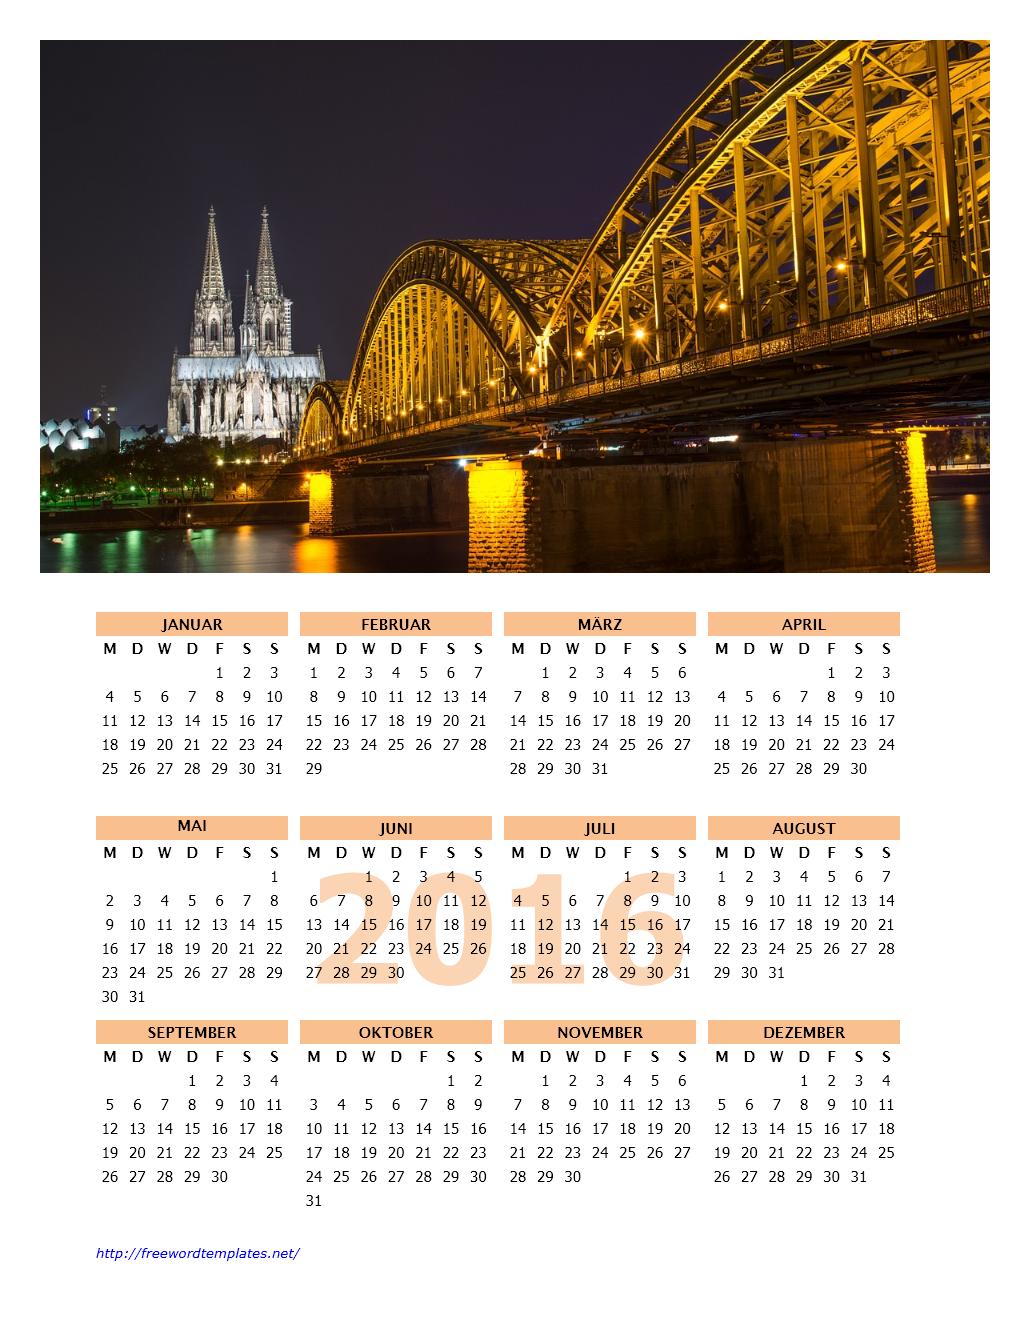 Kalender 2016 mit Foto